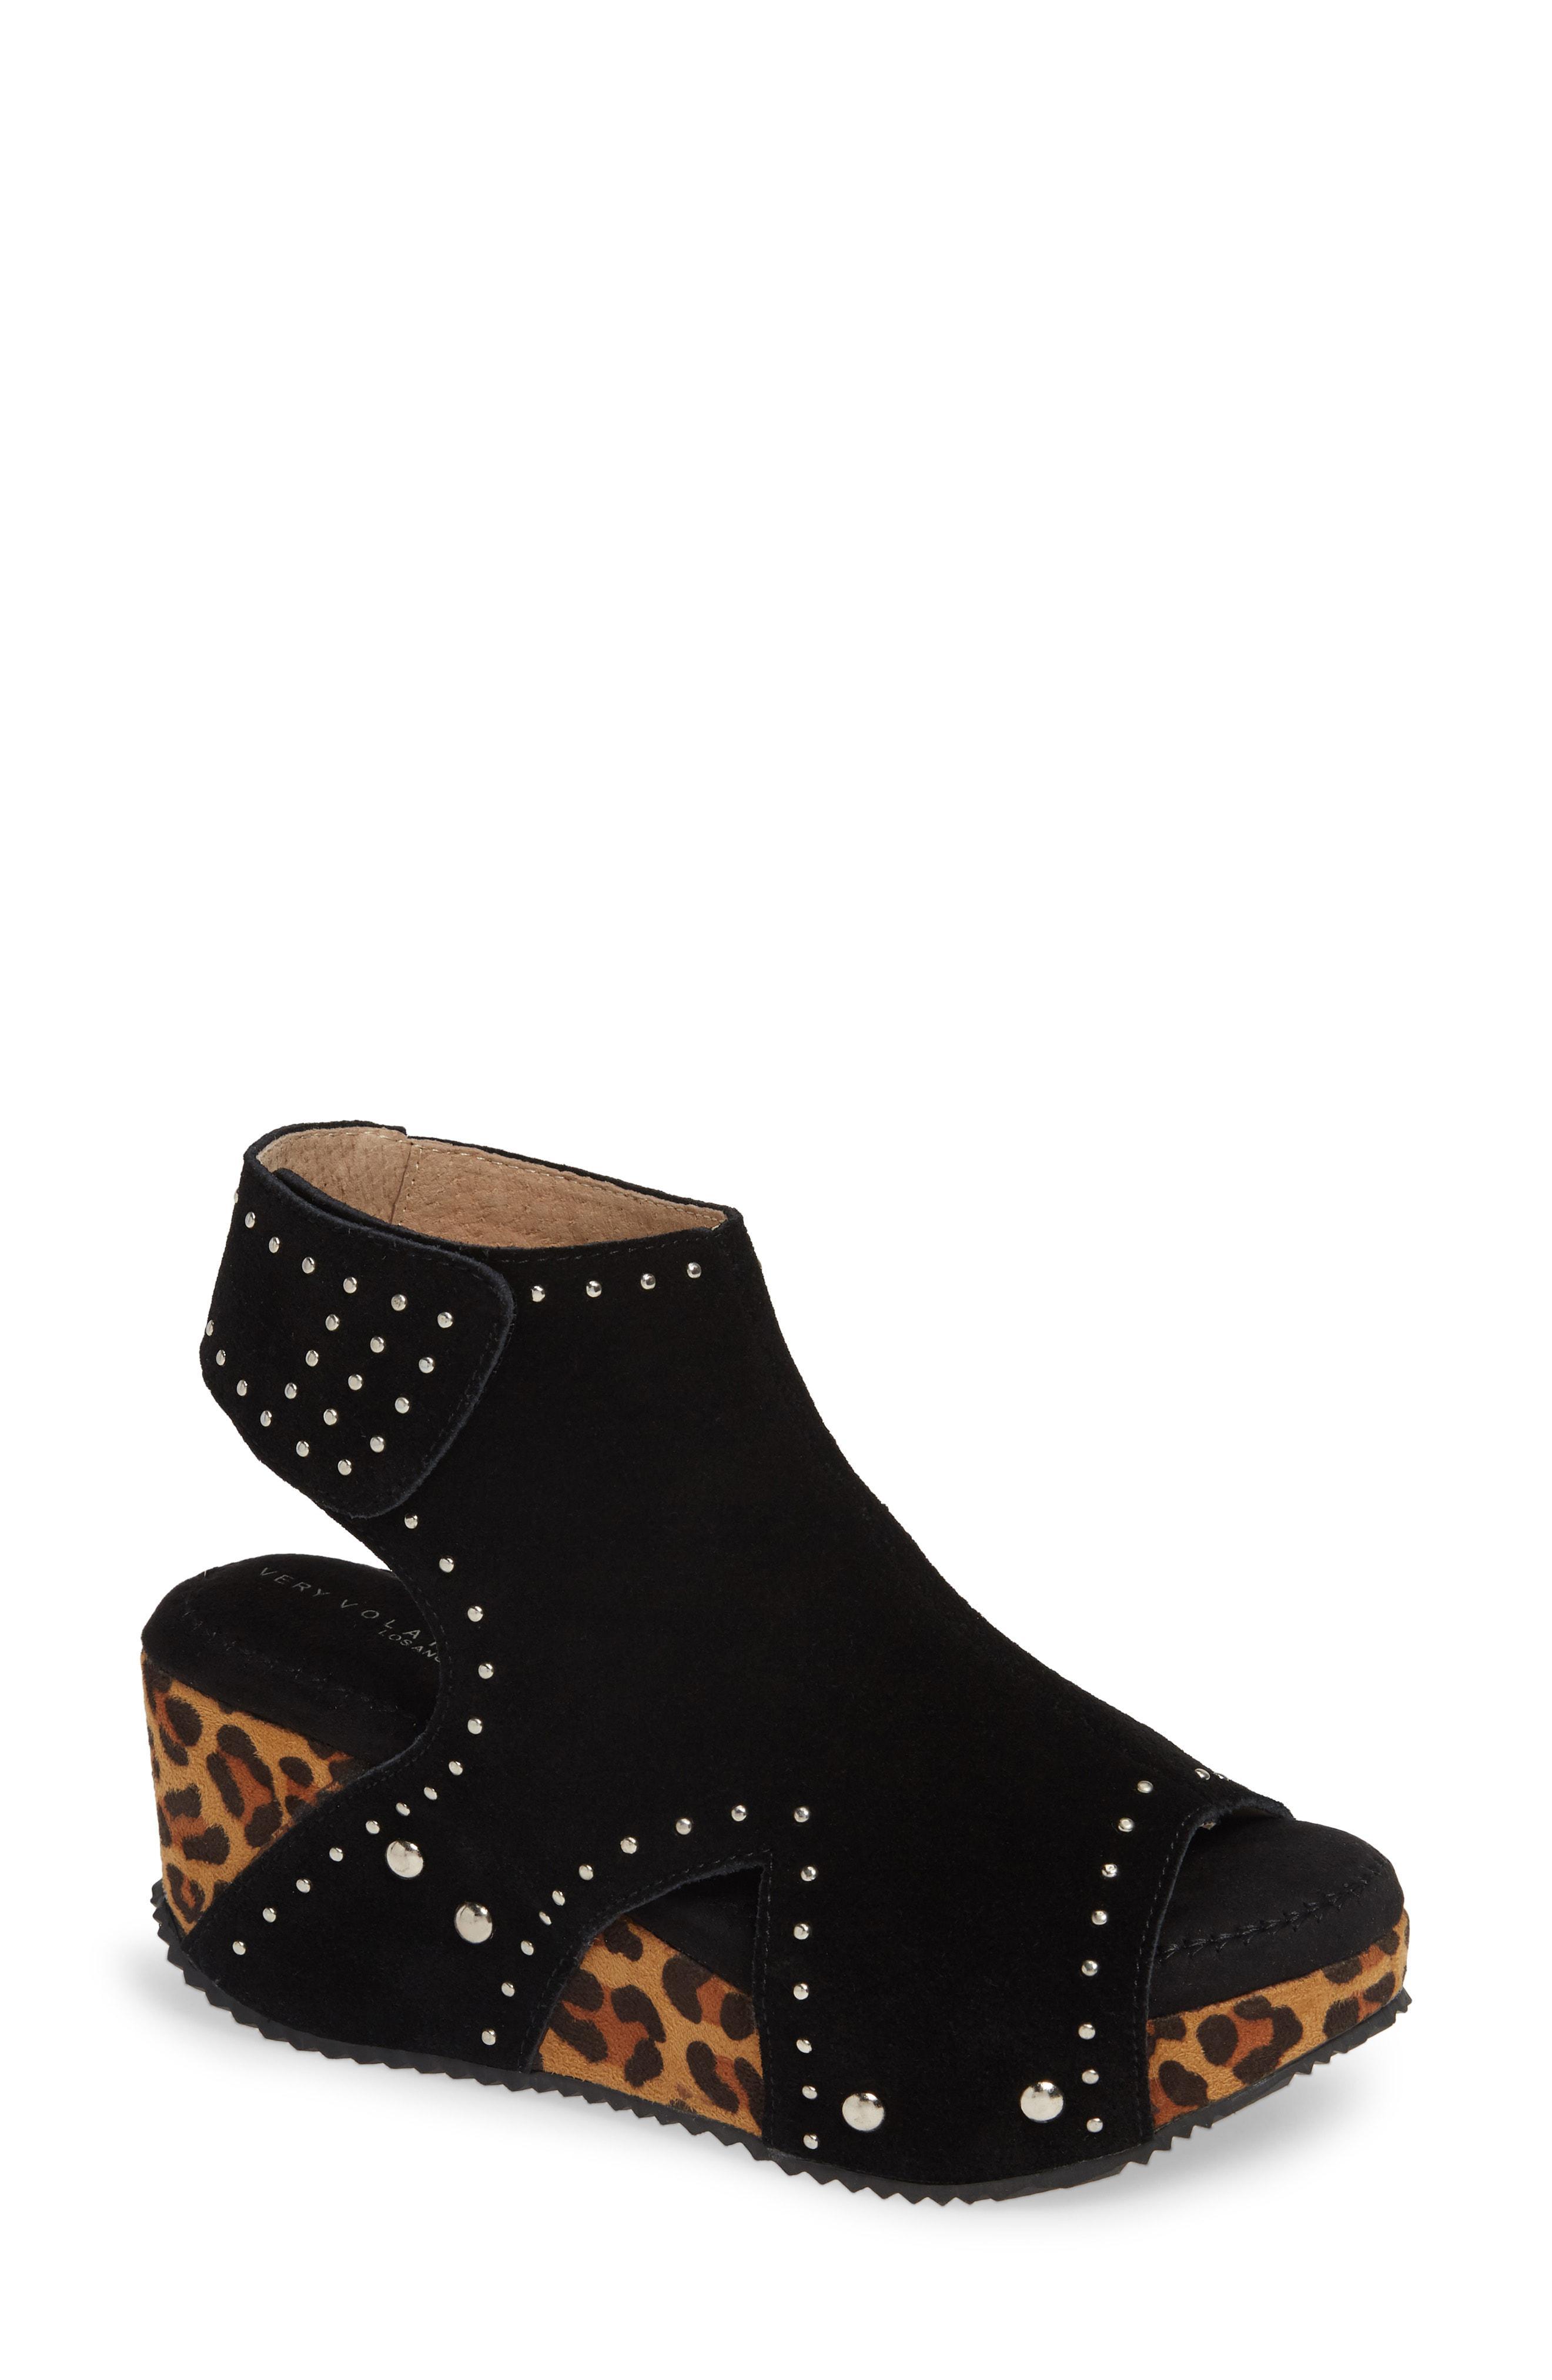 5219c7dff86 Lyst - Very Volatile Betsy Platform Wedge Sandal in Black